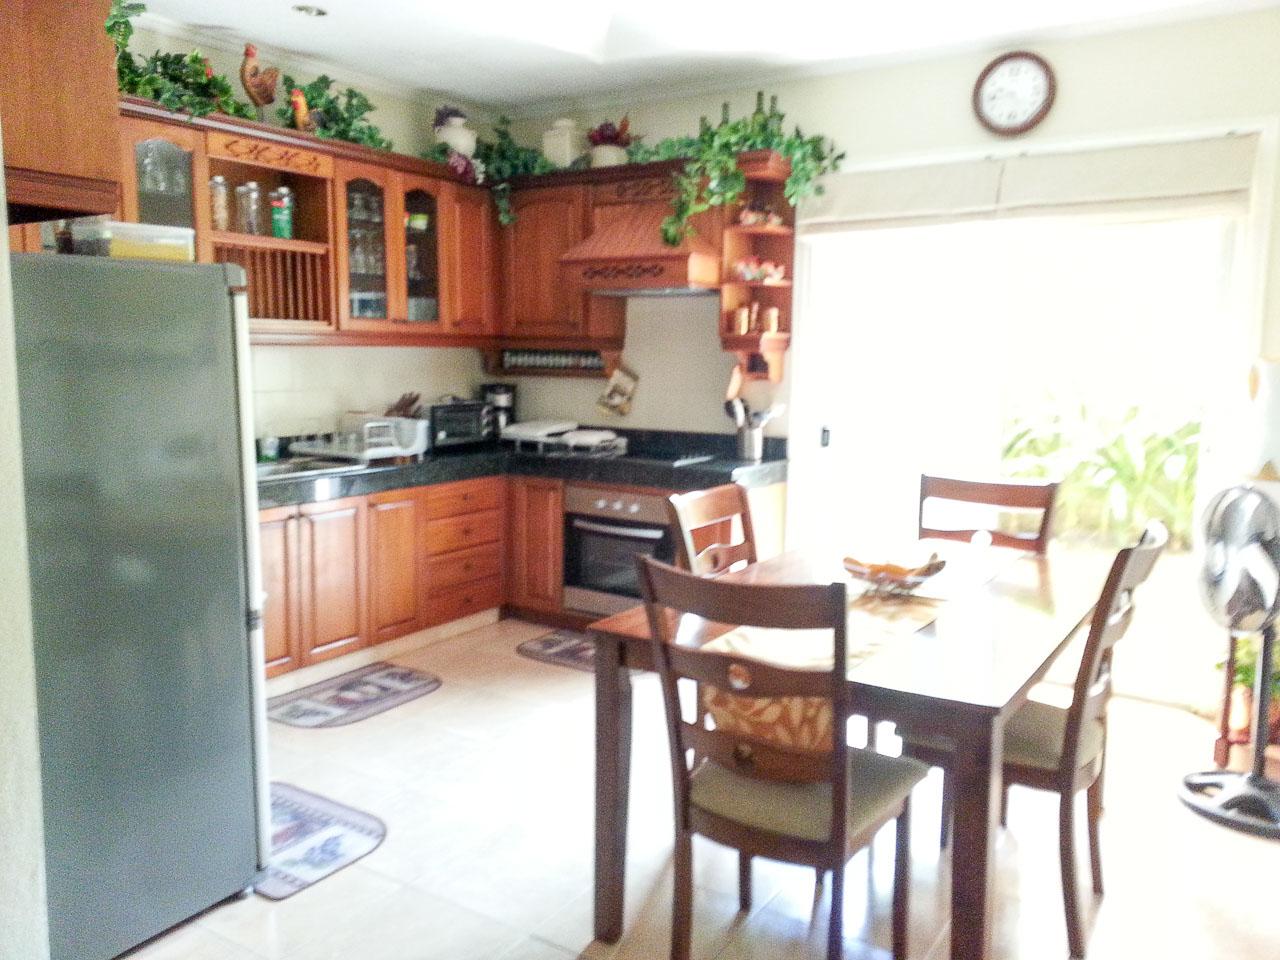 ... SRB42 4 Bedroom House For Sale In Maria Luisa Estate Park Cebu C ...